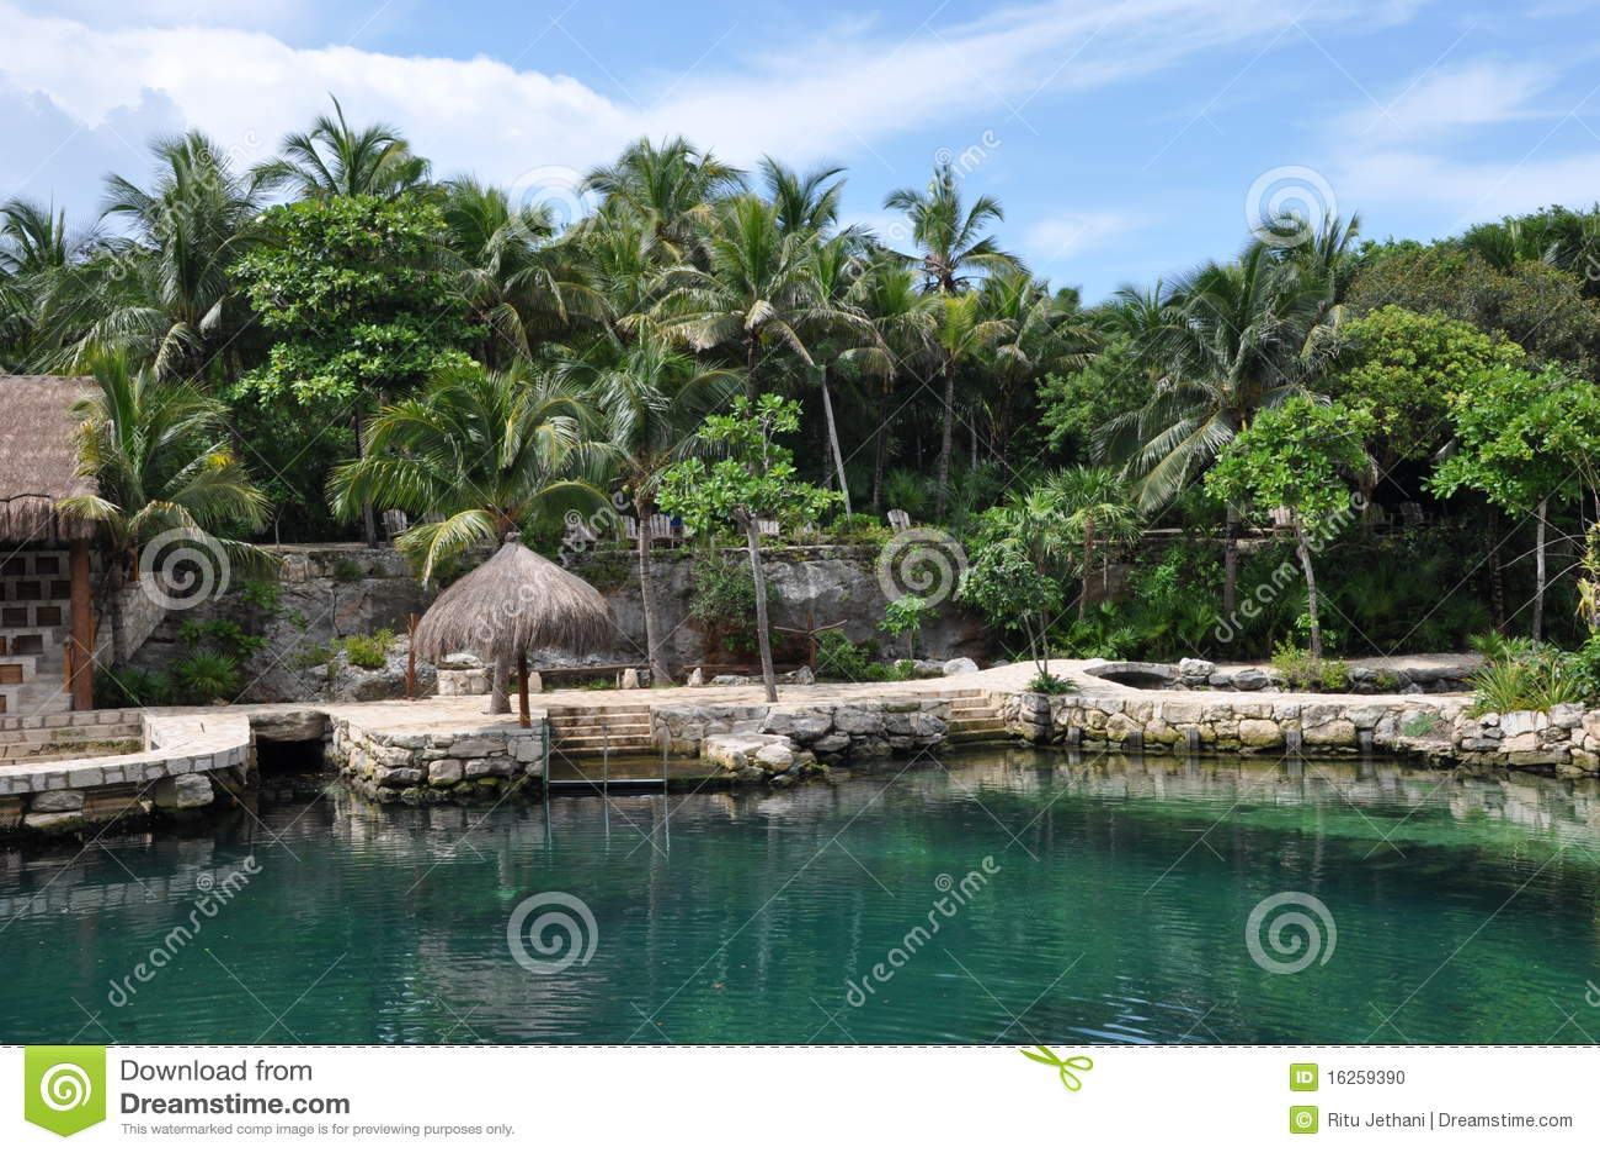 Tropical Beach Huts: Tropical Beach Huts Stock Photo. Image Of Palm, Shade